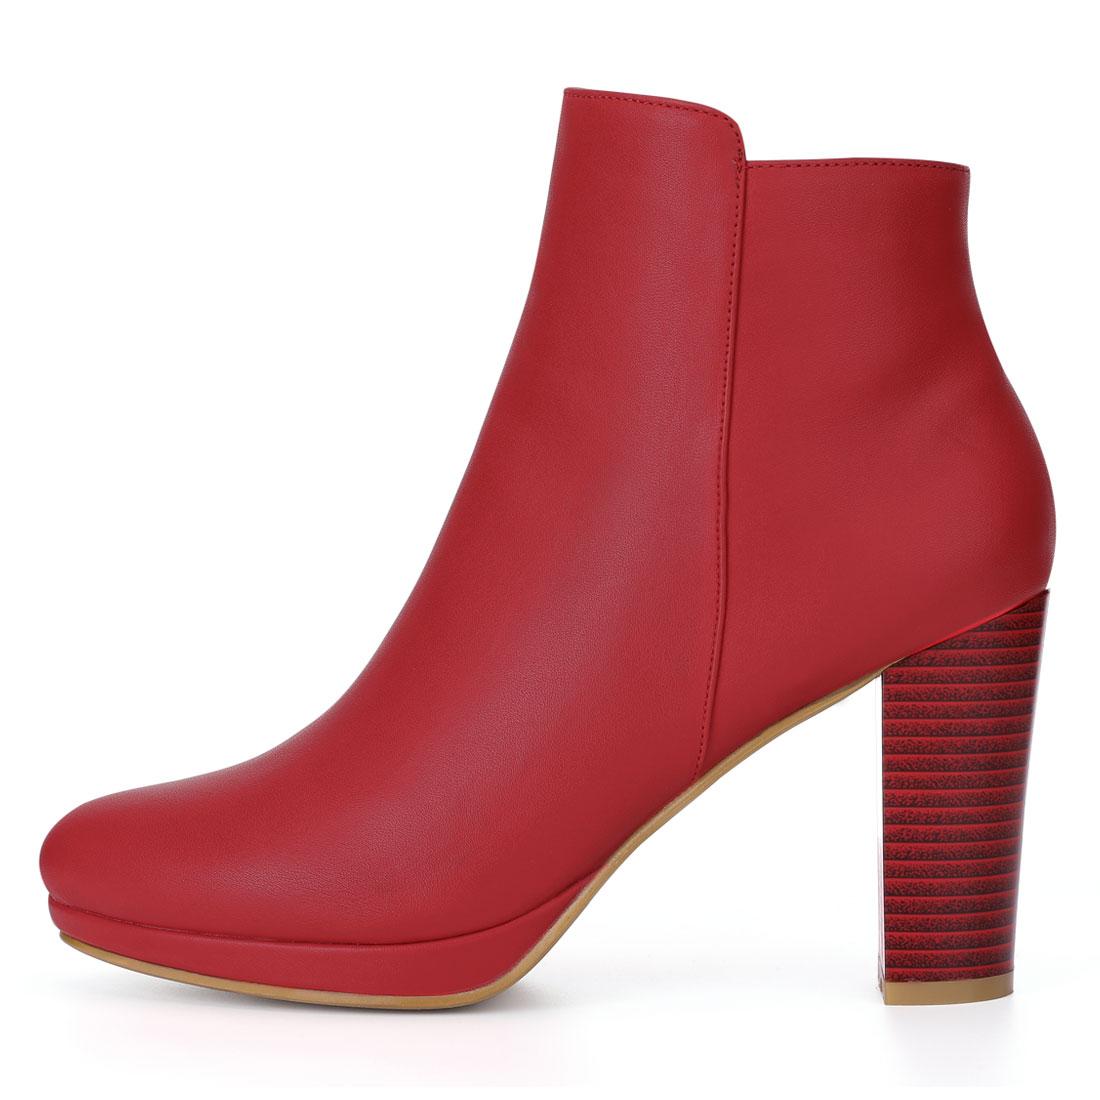 Allegra K Women Round Toe Chunky Heel Platform Ankle Boots Red US 9.5